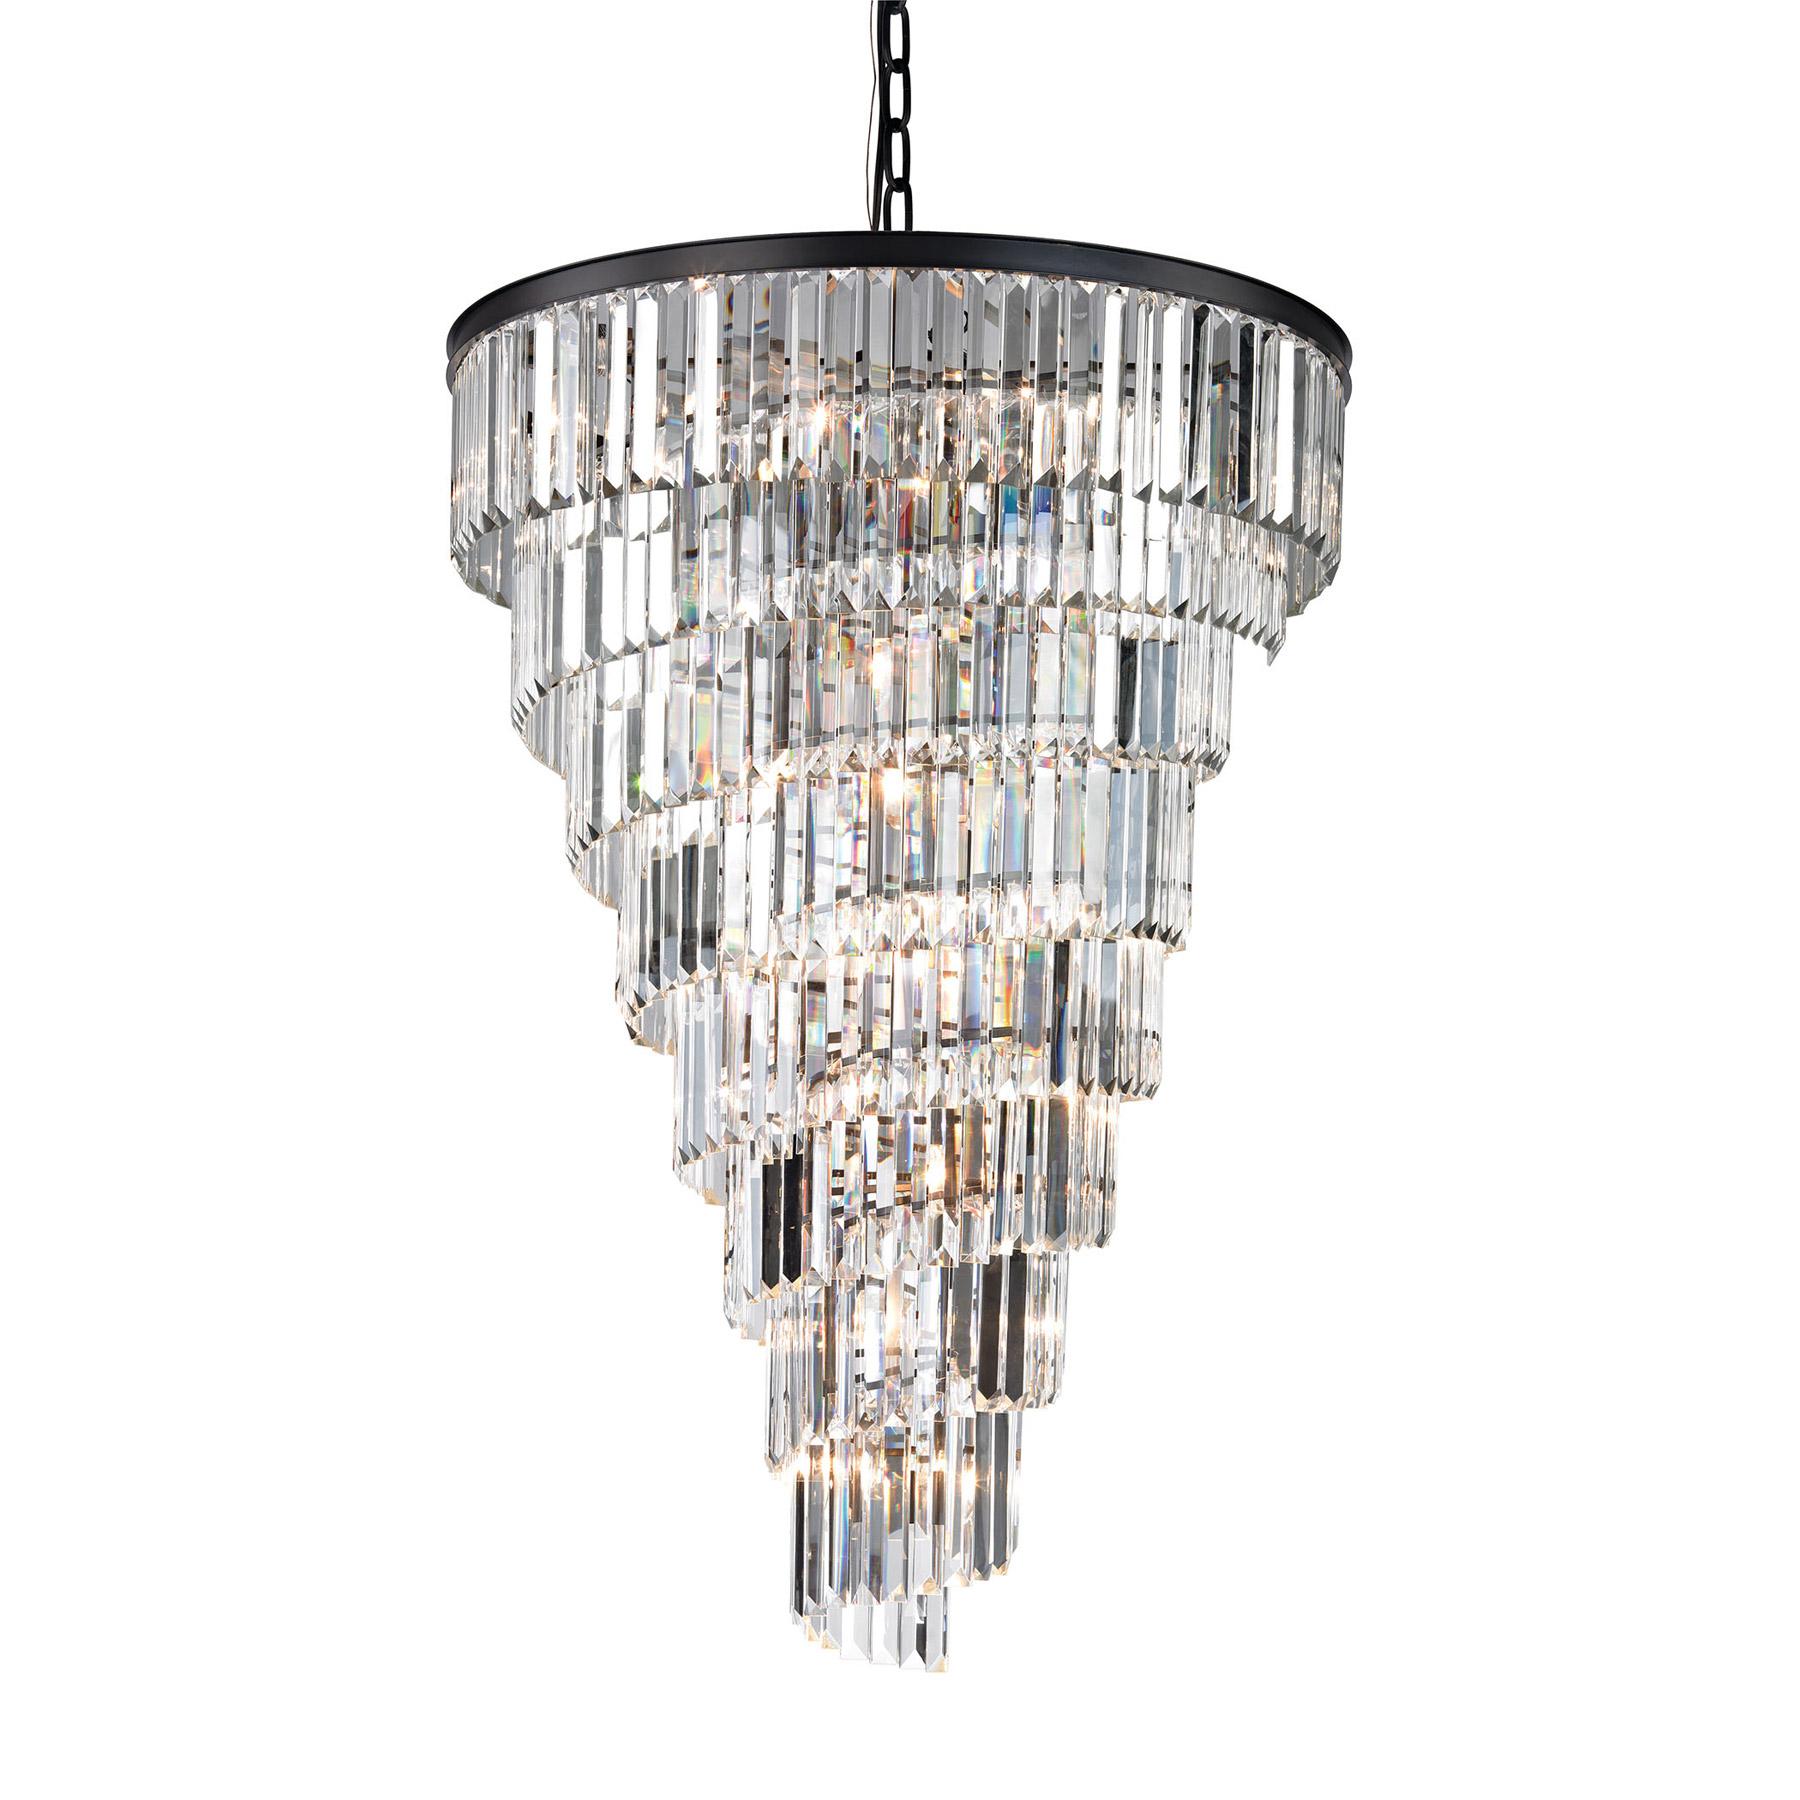 Lighting 14 Crystal Palacial 14 Light Chandelier In Oil